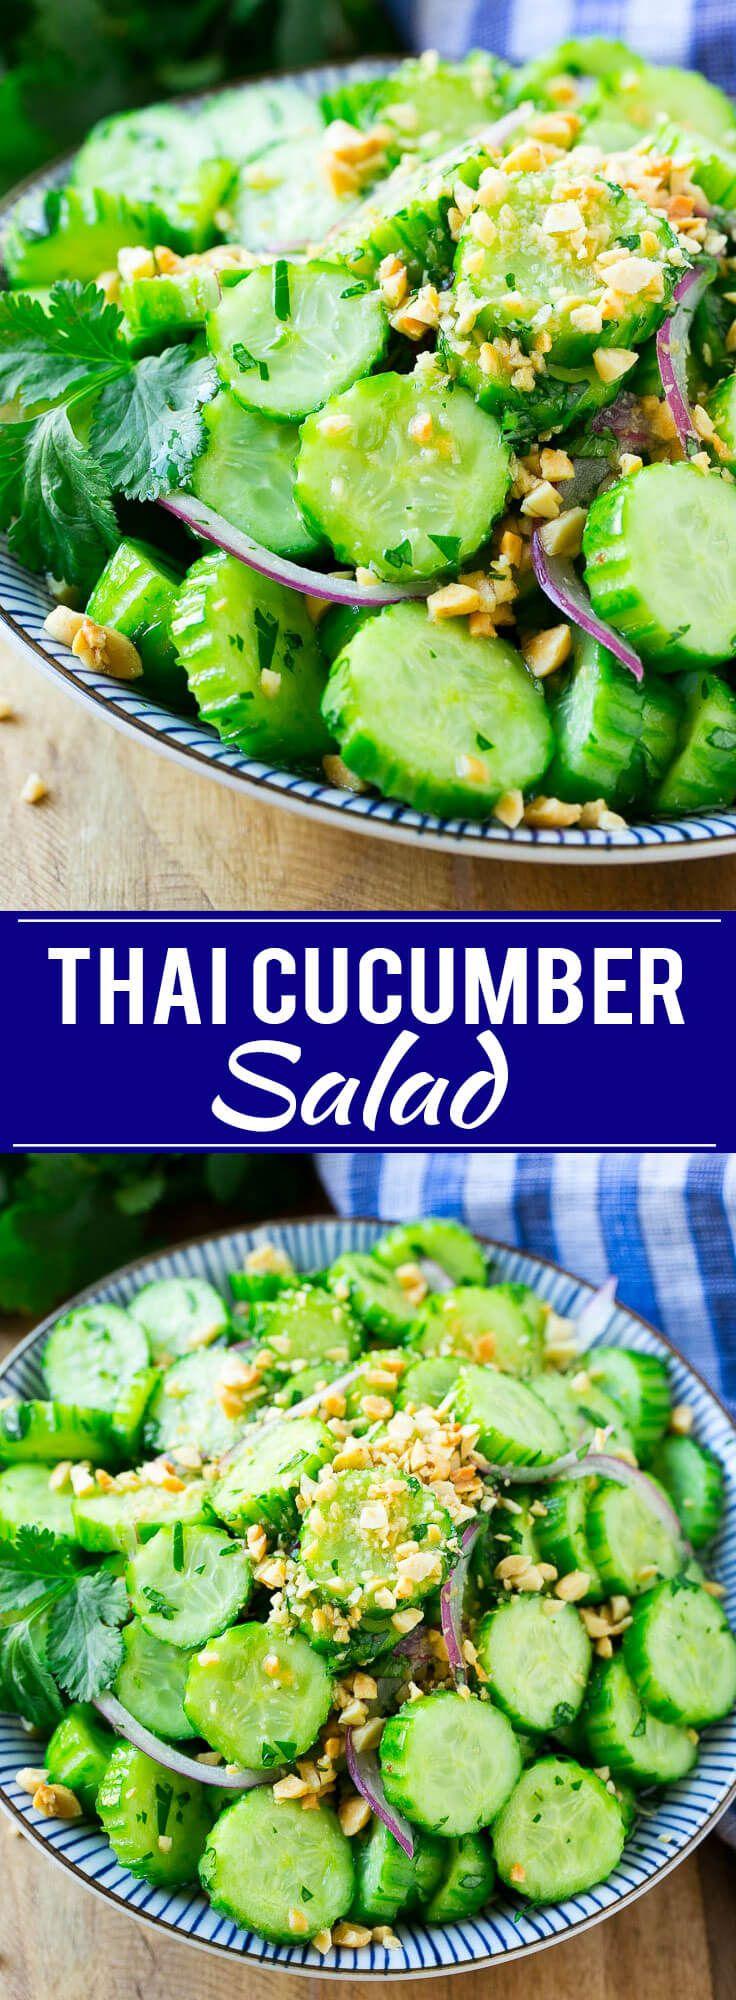 Thai Cucumber Salad | Easy Cucumber Salad | Thai Food | Healthy Salad